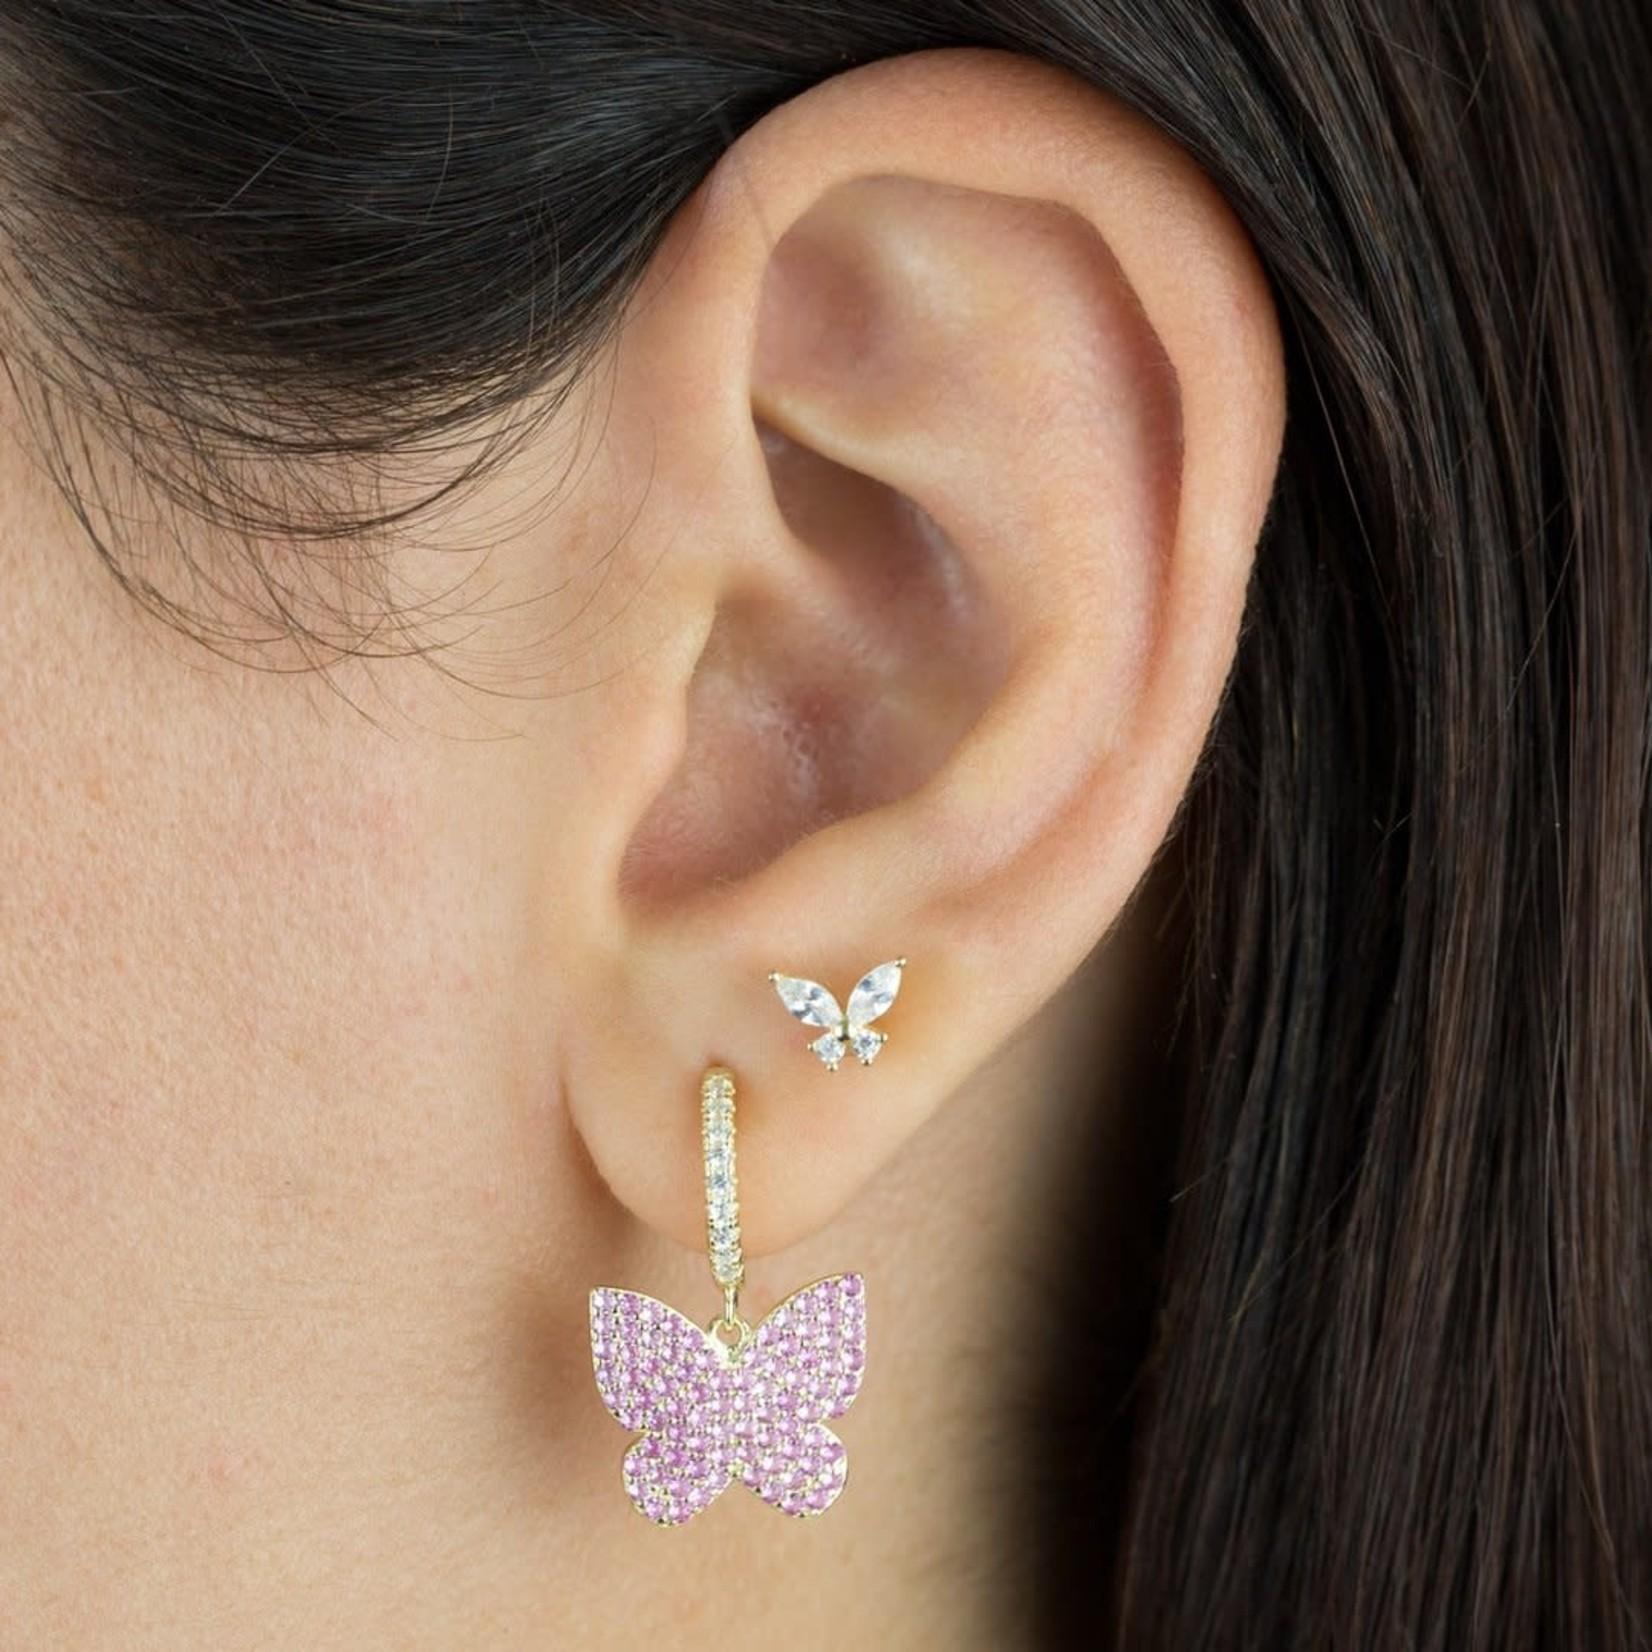 Adinas CZ Crystal Butterfly Stud Earrings